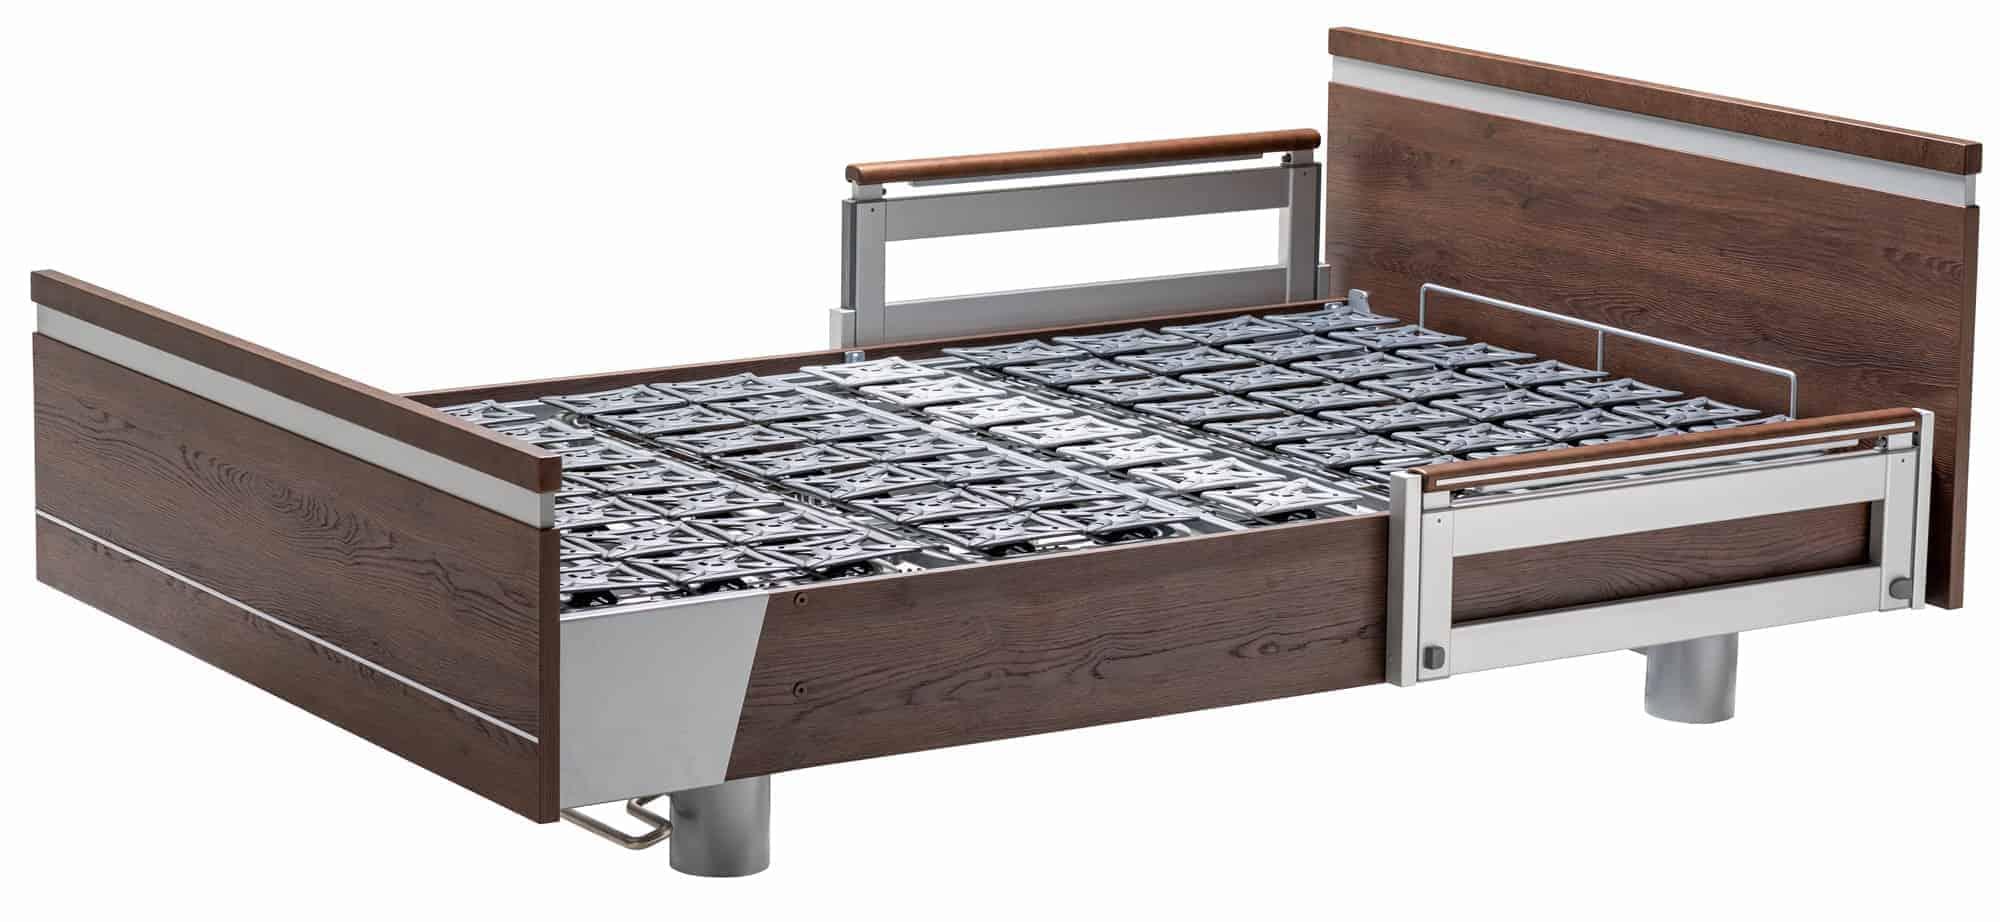 SonderCare Aura™ Wide Hospital Bed Frame and Comfort Deck